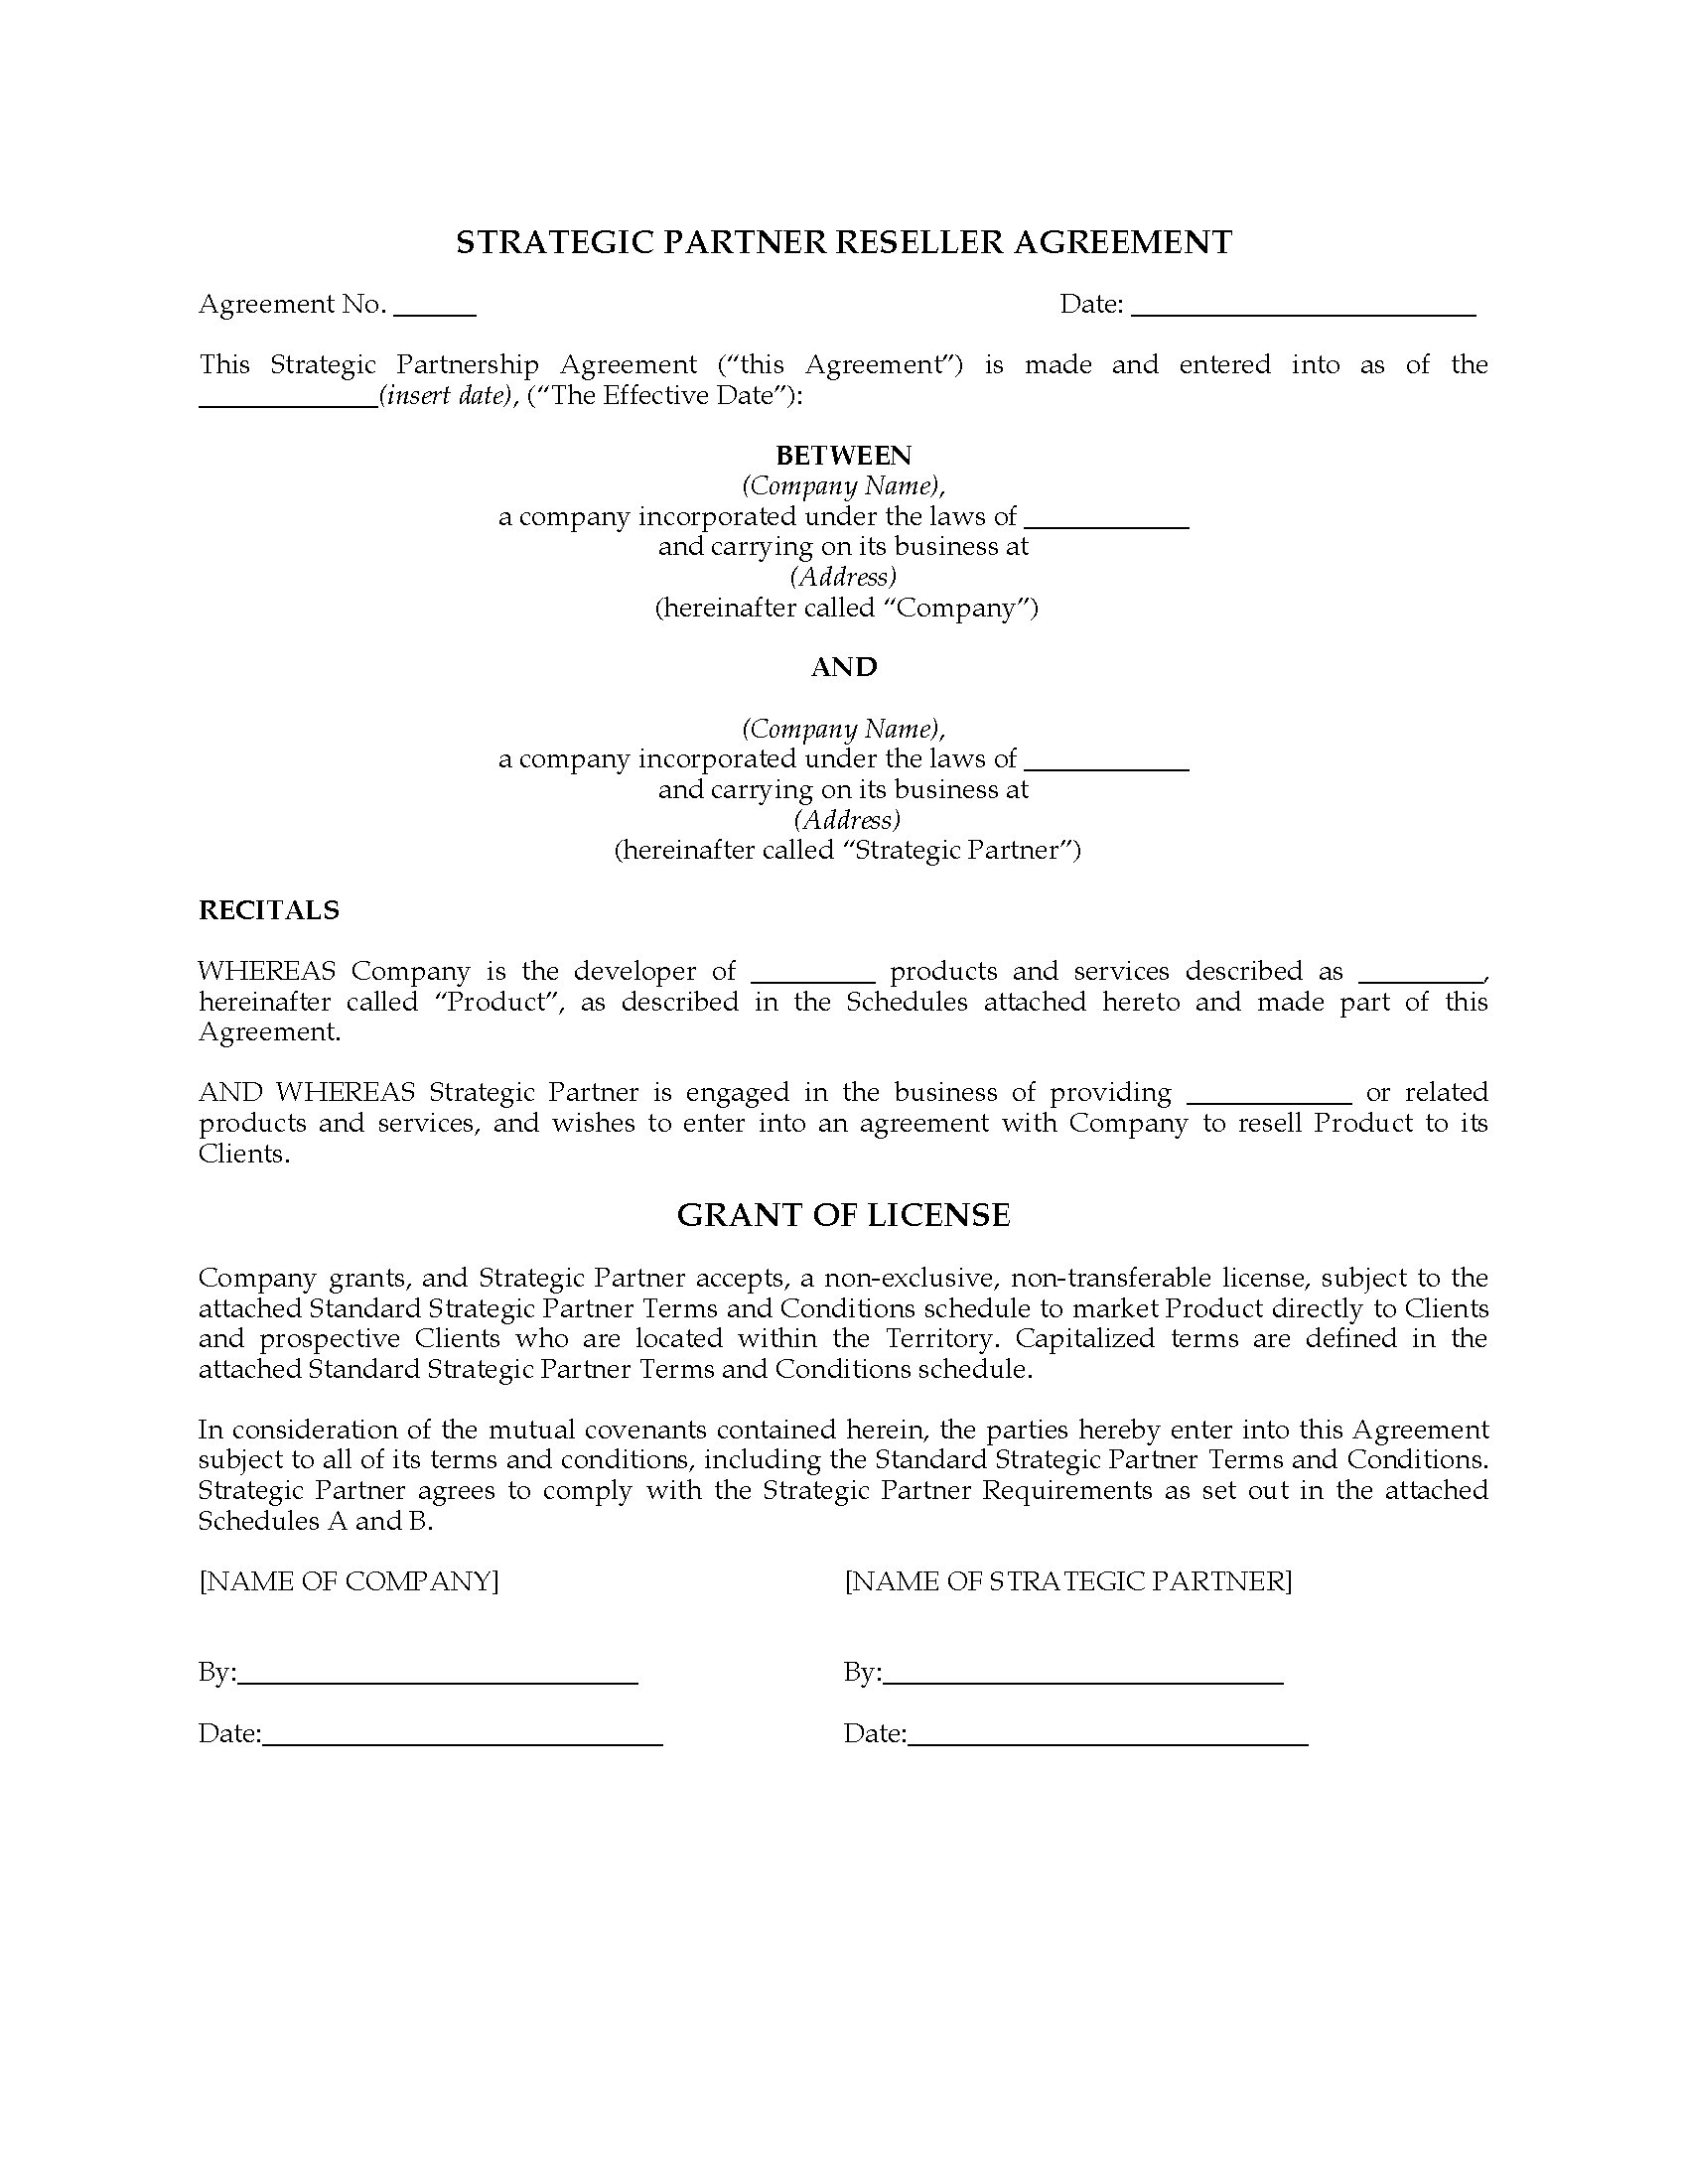 strategic partner reseller agreement legal forms and business templates. Black Bedroom Furniture Sets. Home Design Ideas